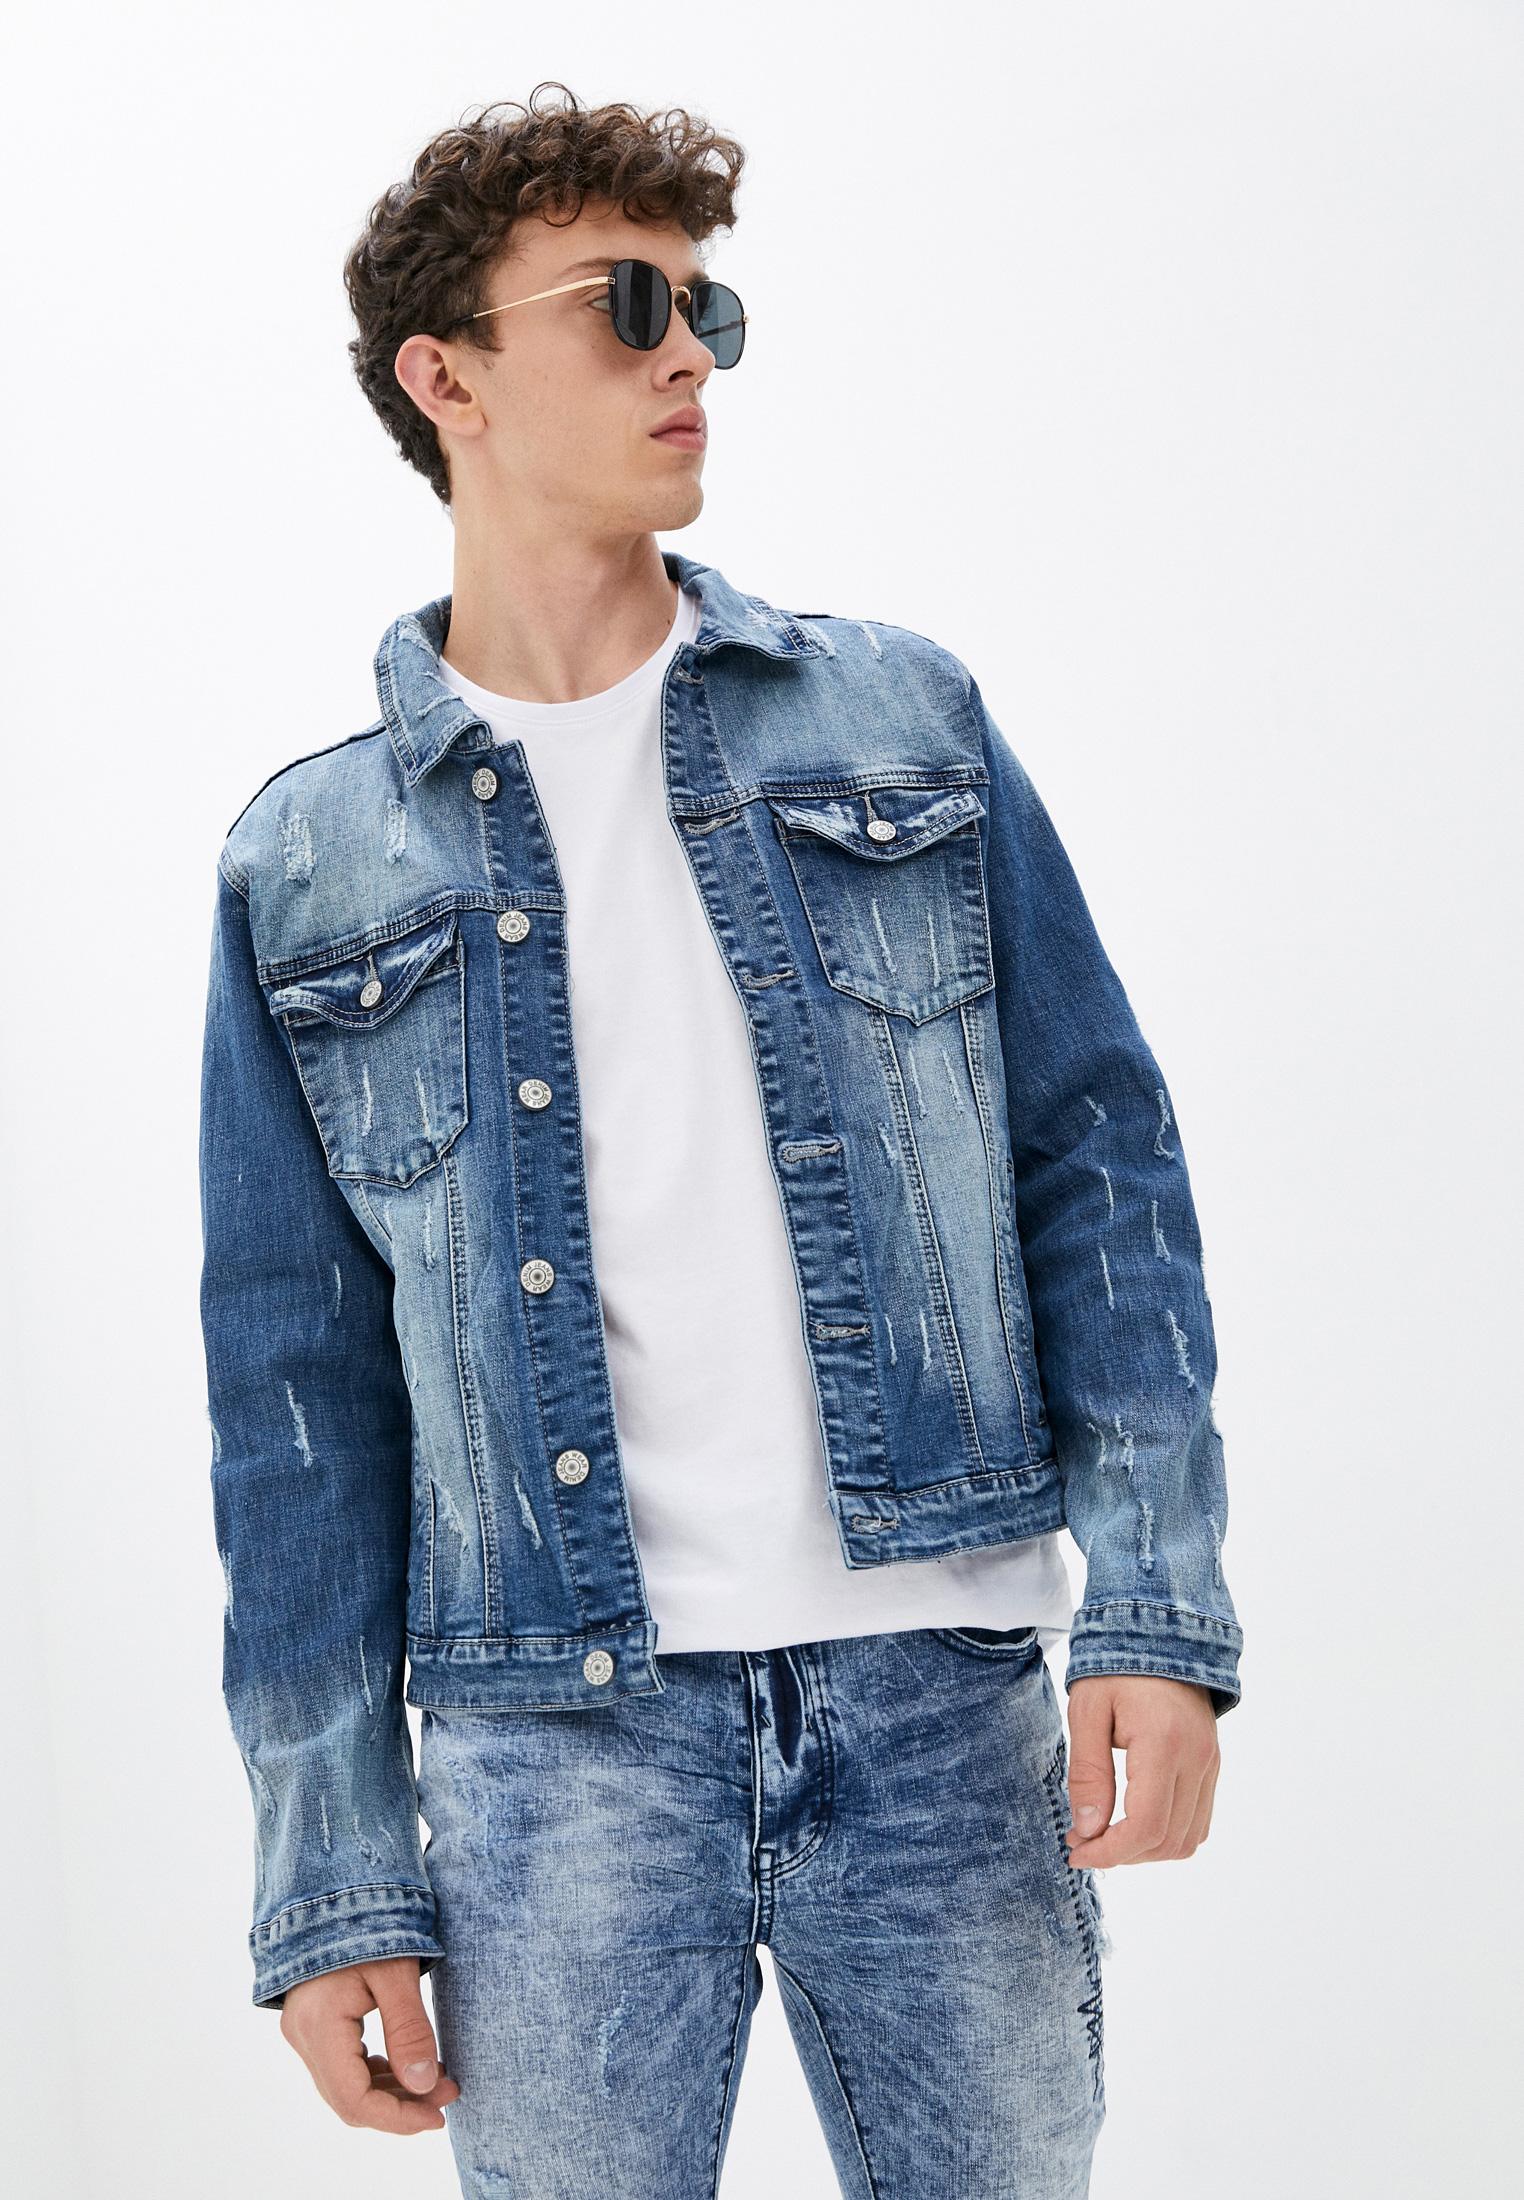 Джинсовая куртка Terance Kole Куртка джинсовая Terance Kole